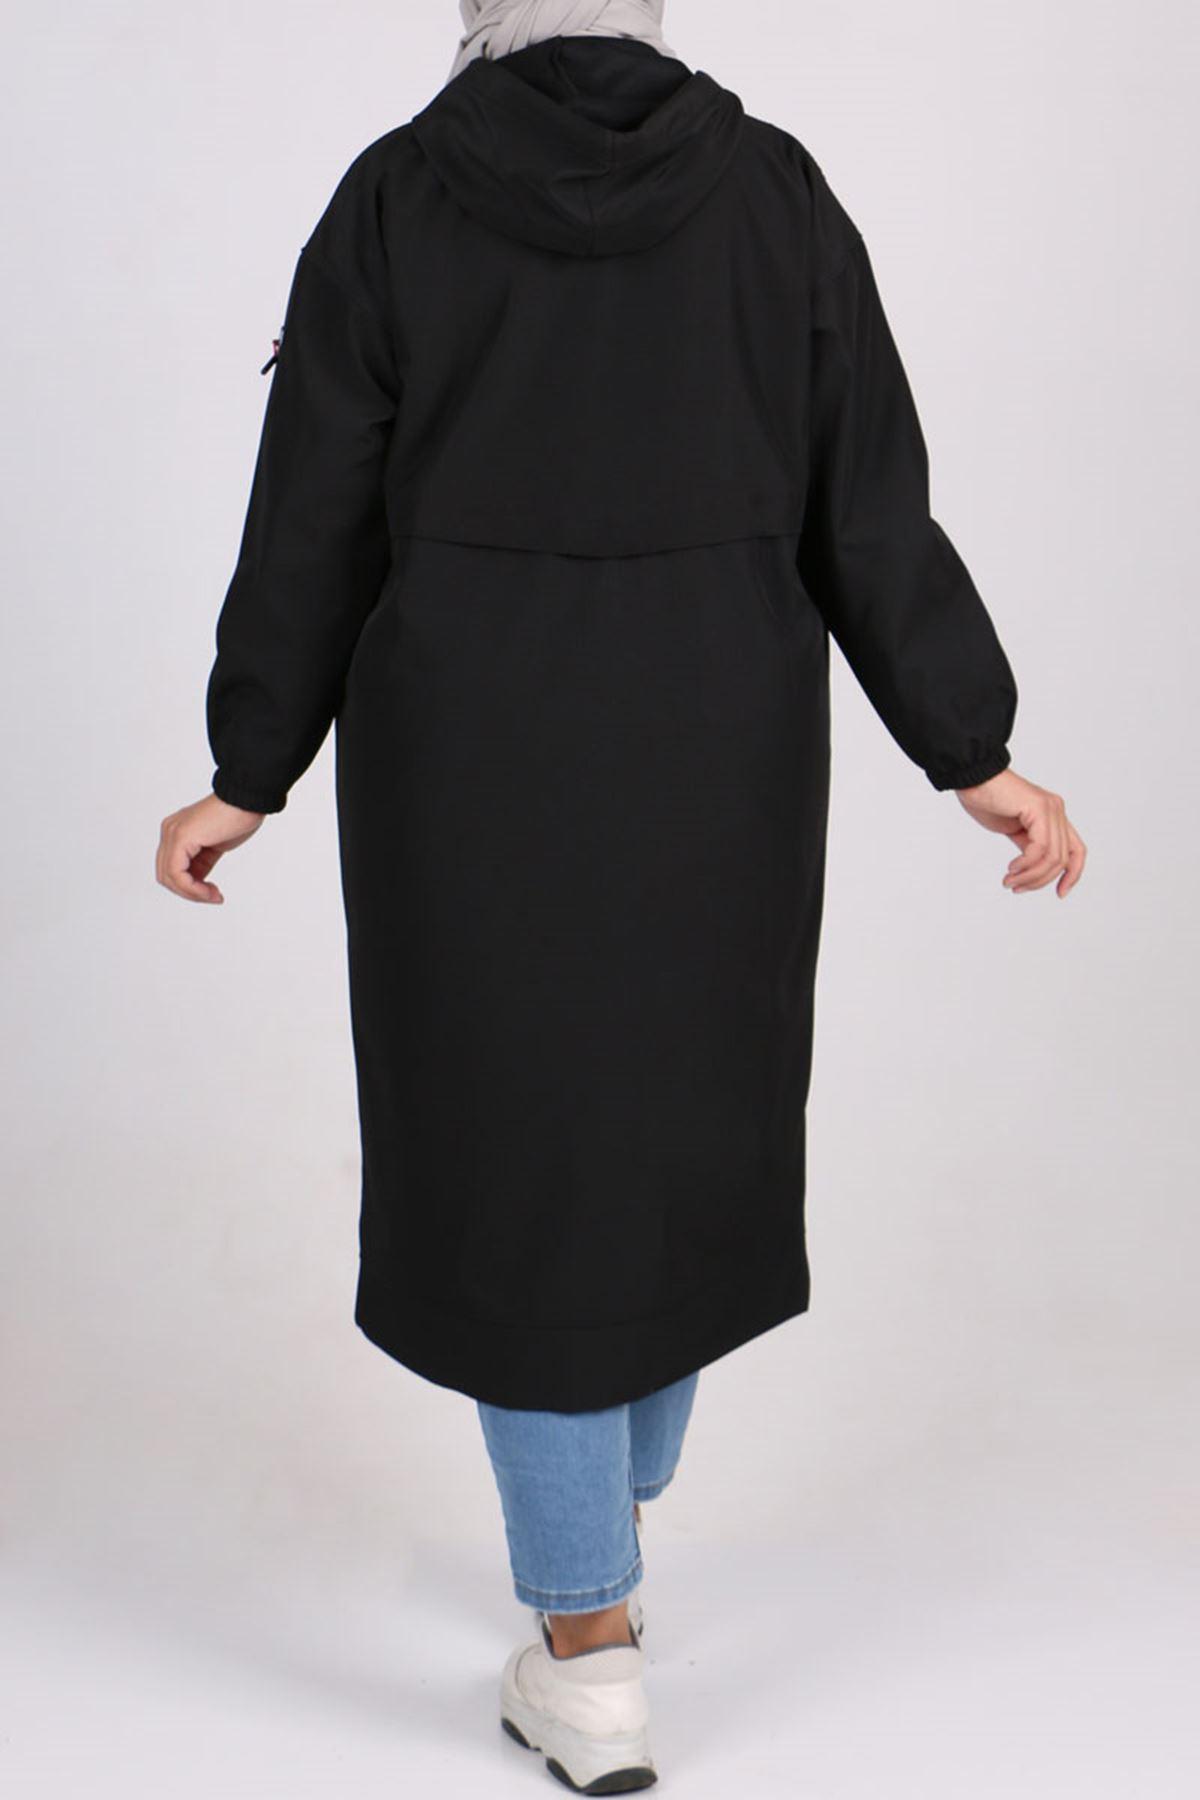 3188 Büyük Beden Bondit Çift Renk Ceket - Siyah-Siyah